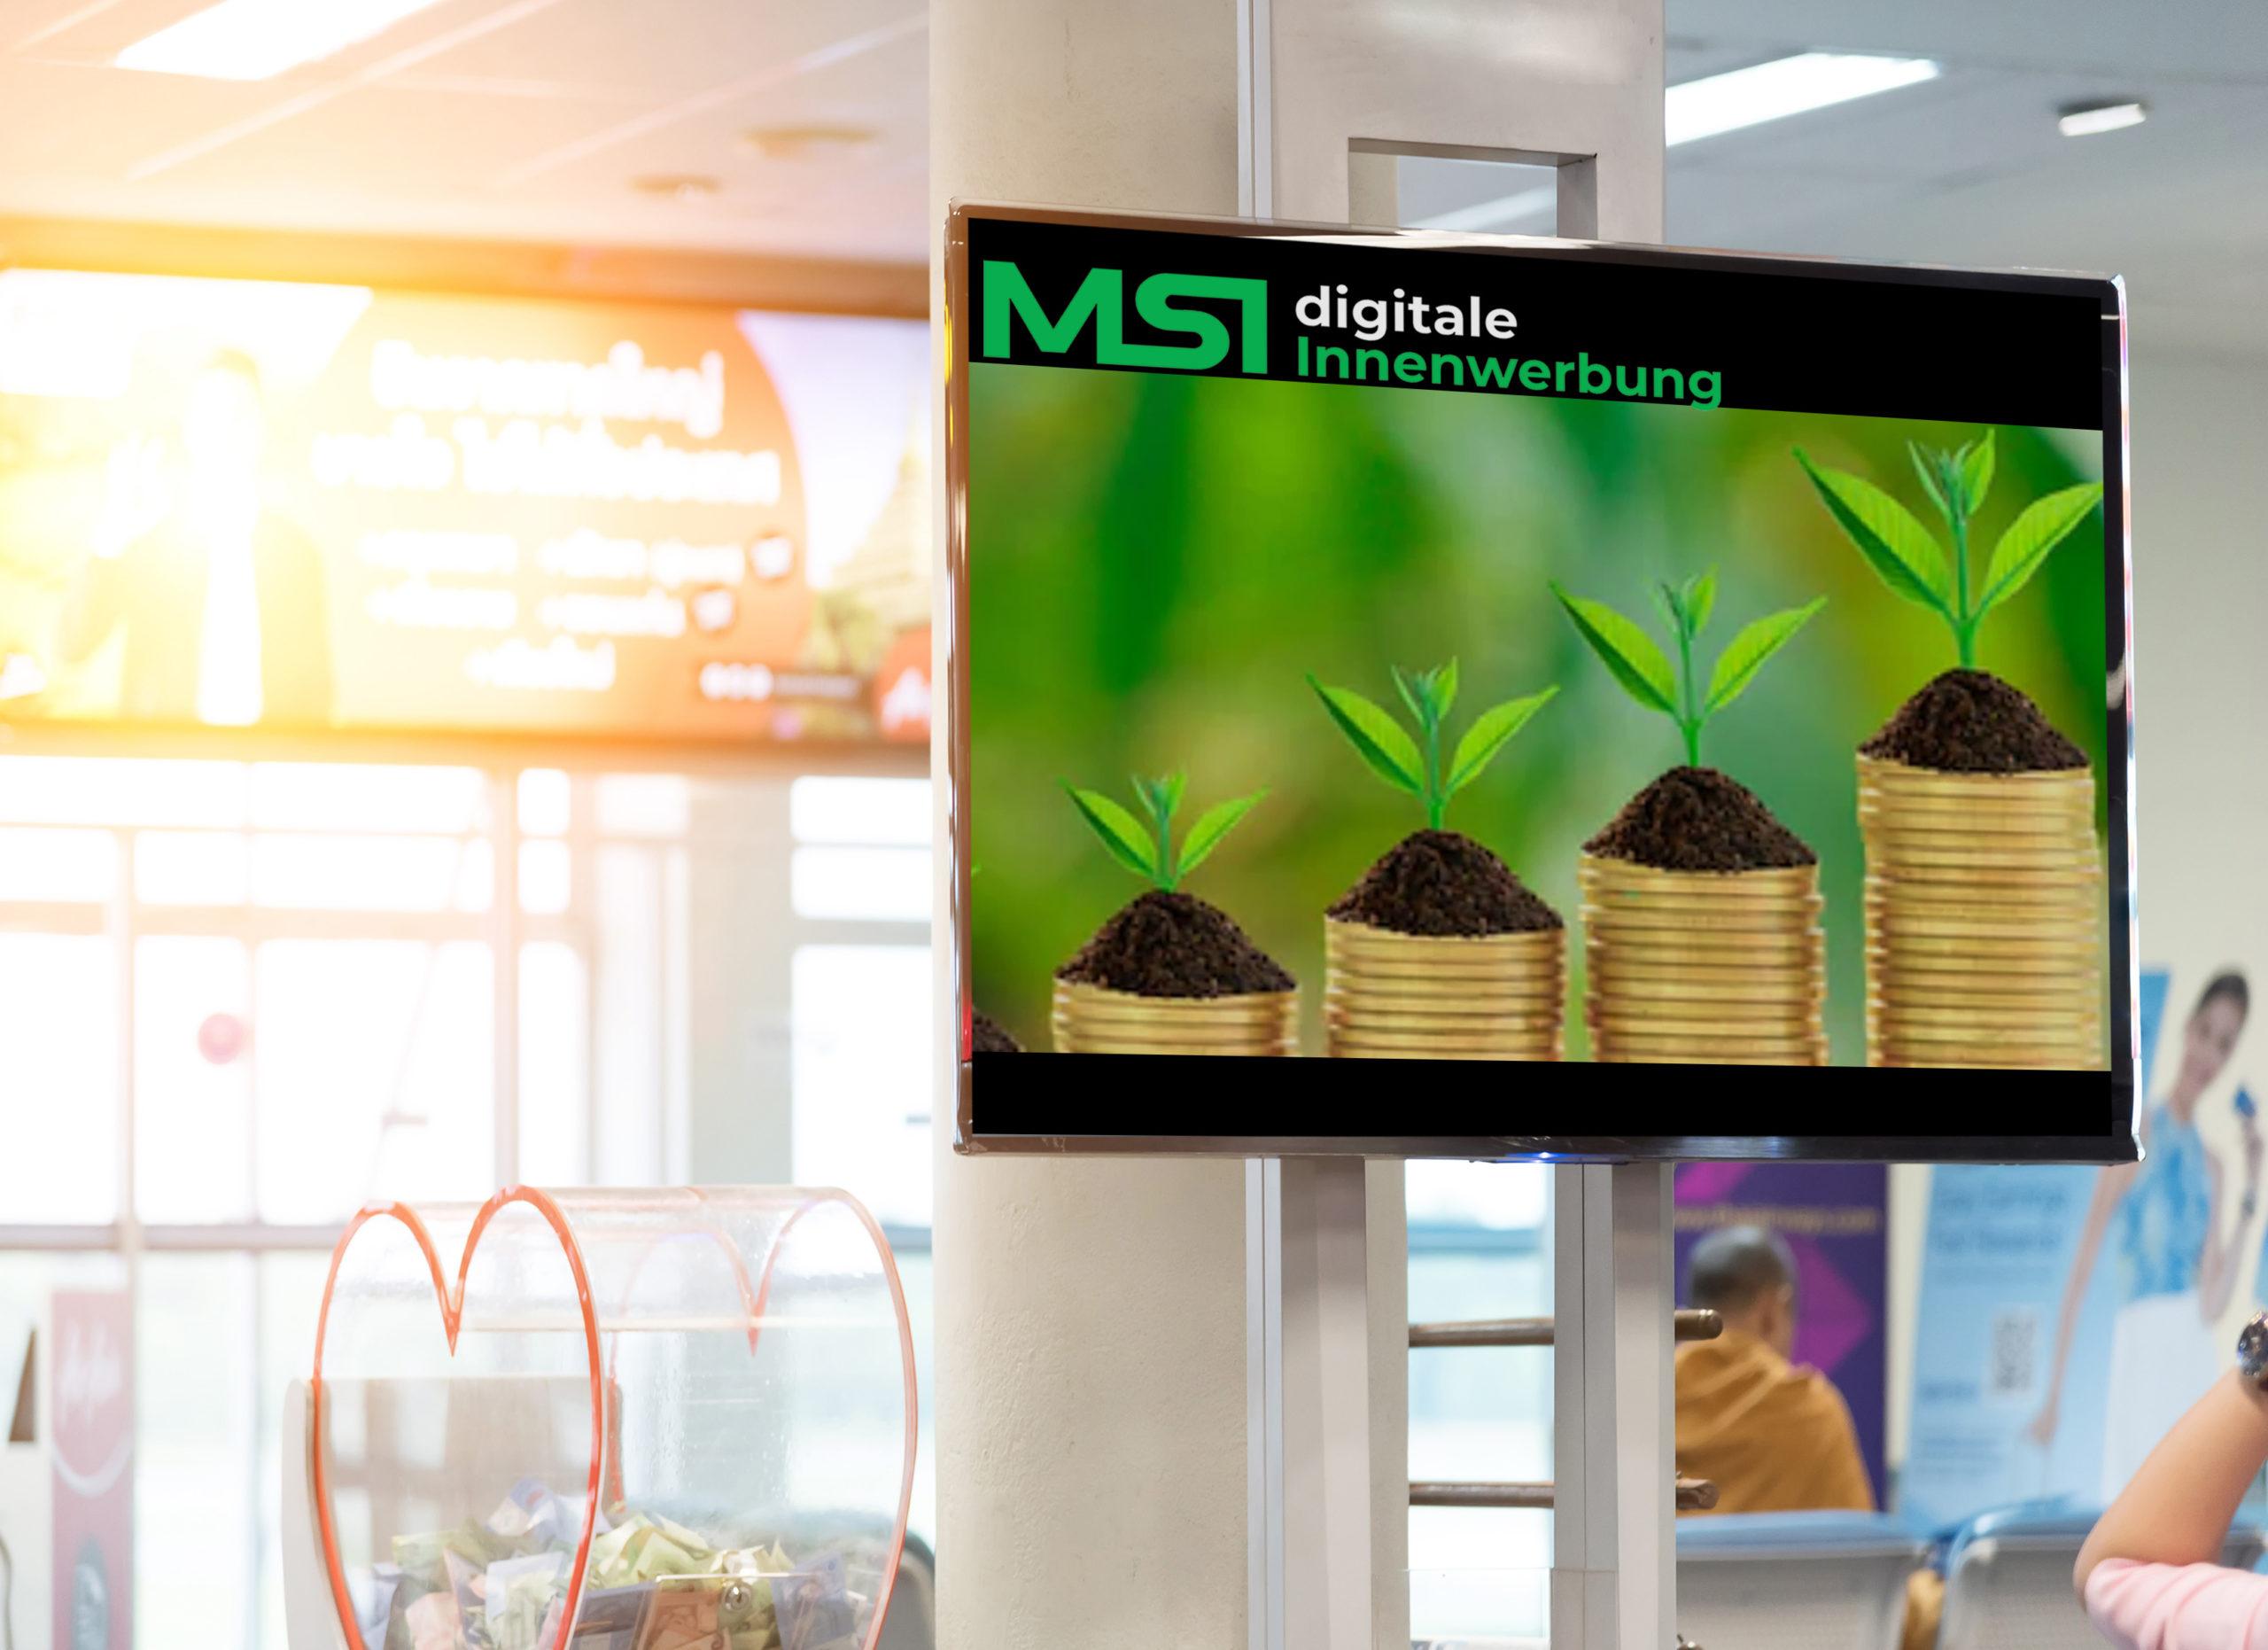 MSI_Marketing_GmbH_224